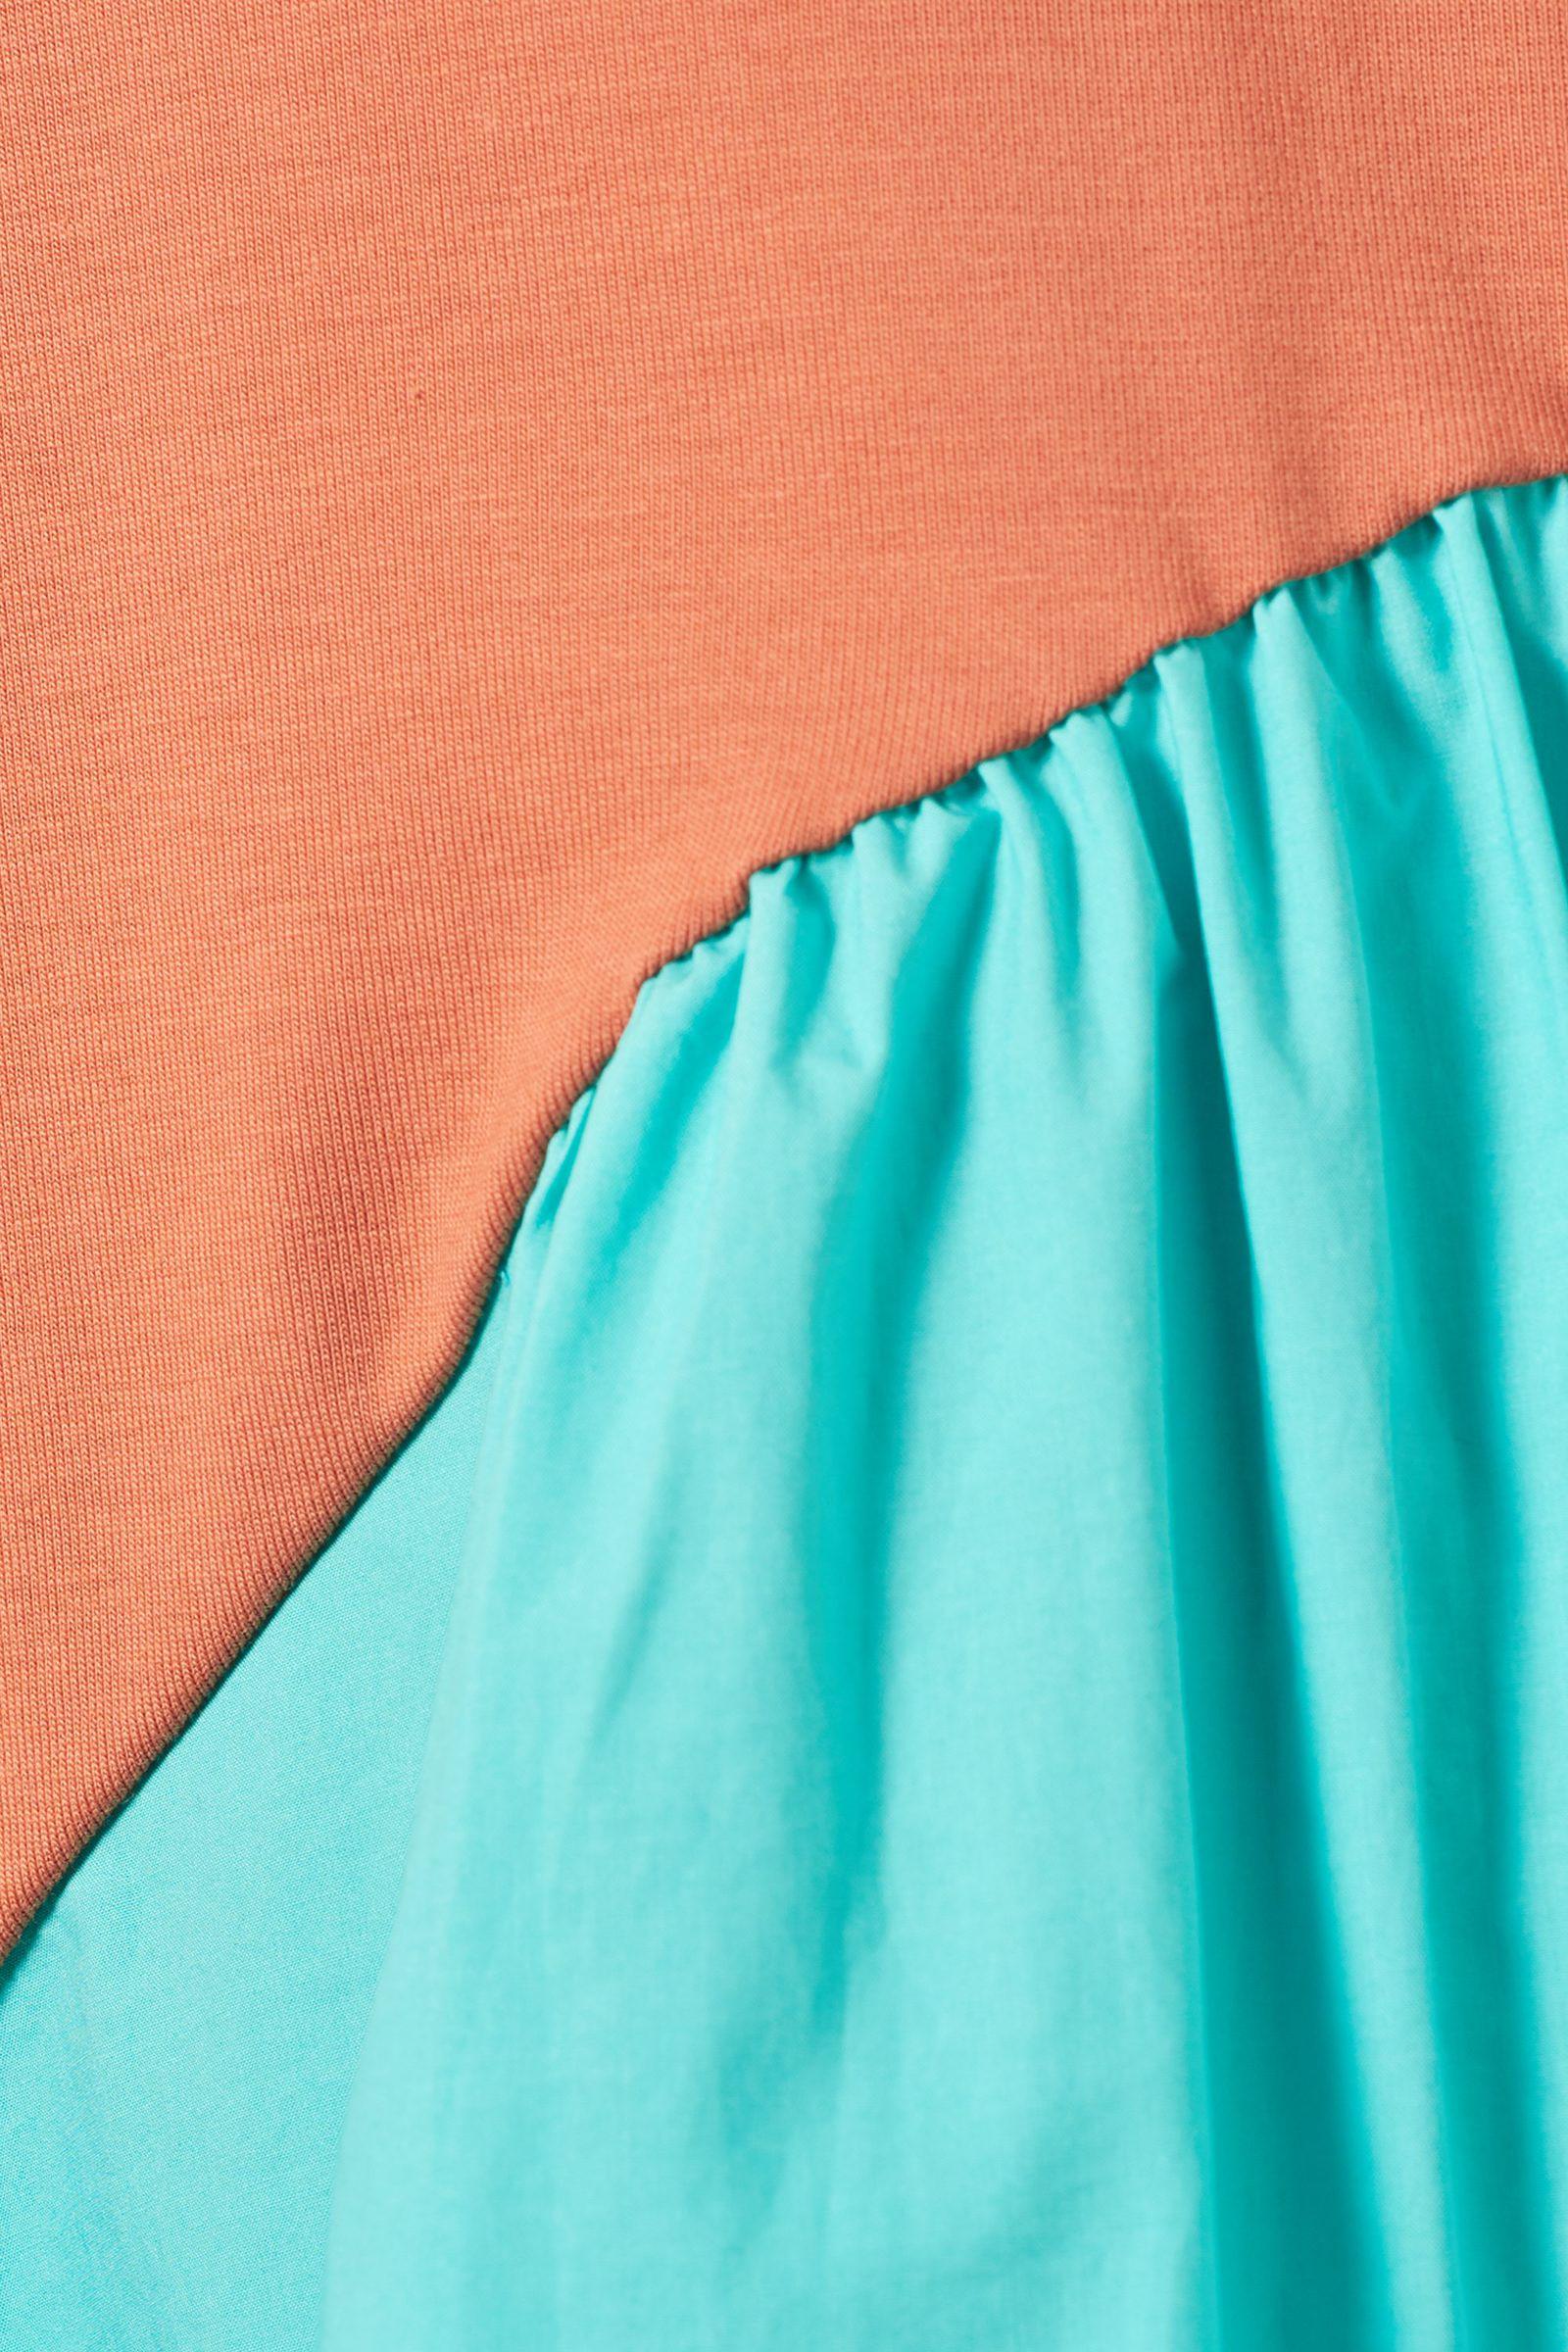 COS 오가닉 코튼 컨트래스트 패널 드레스의 오렌지 / 터쿼이즈컬러 Detail입니다.